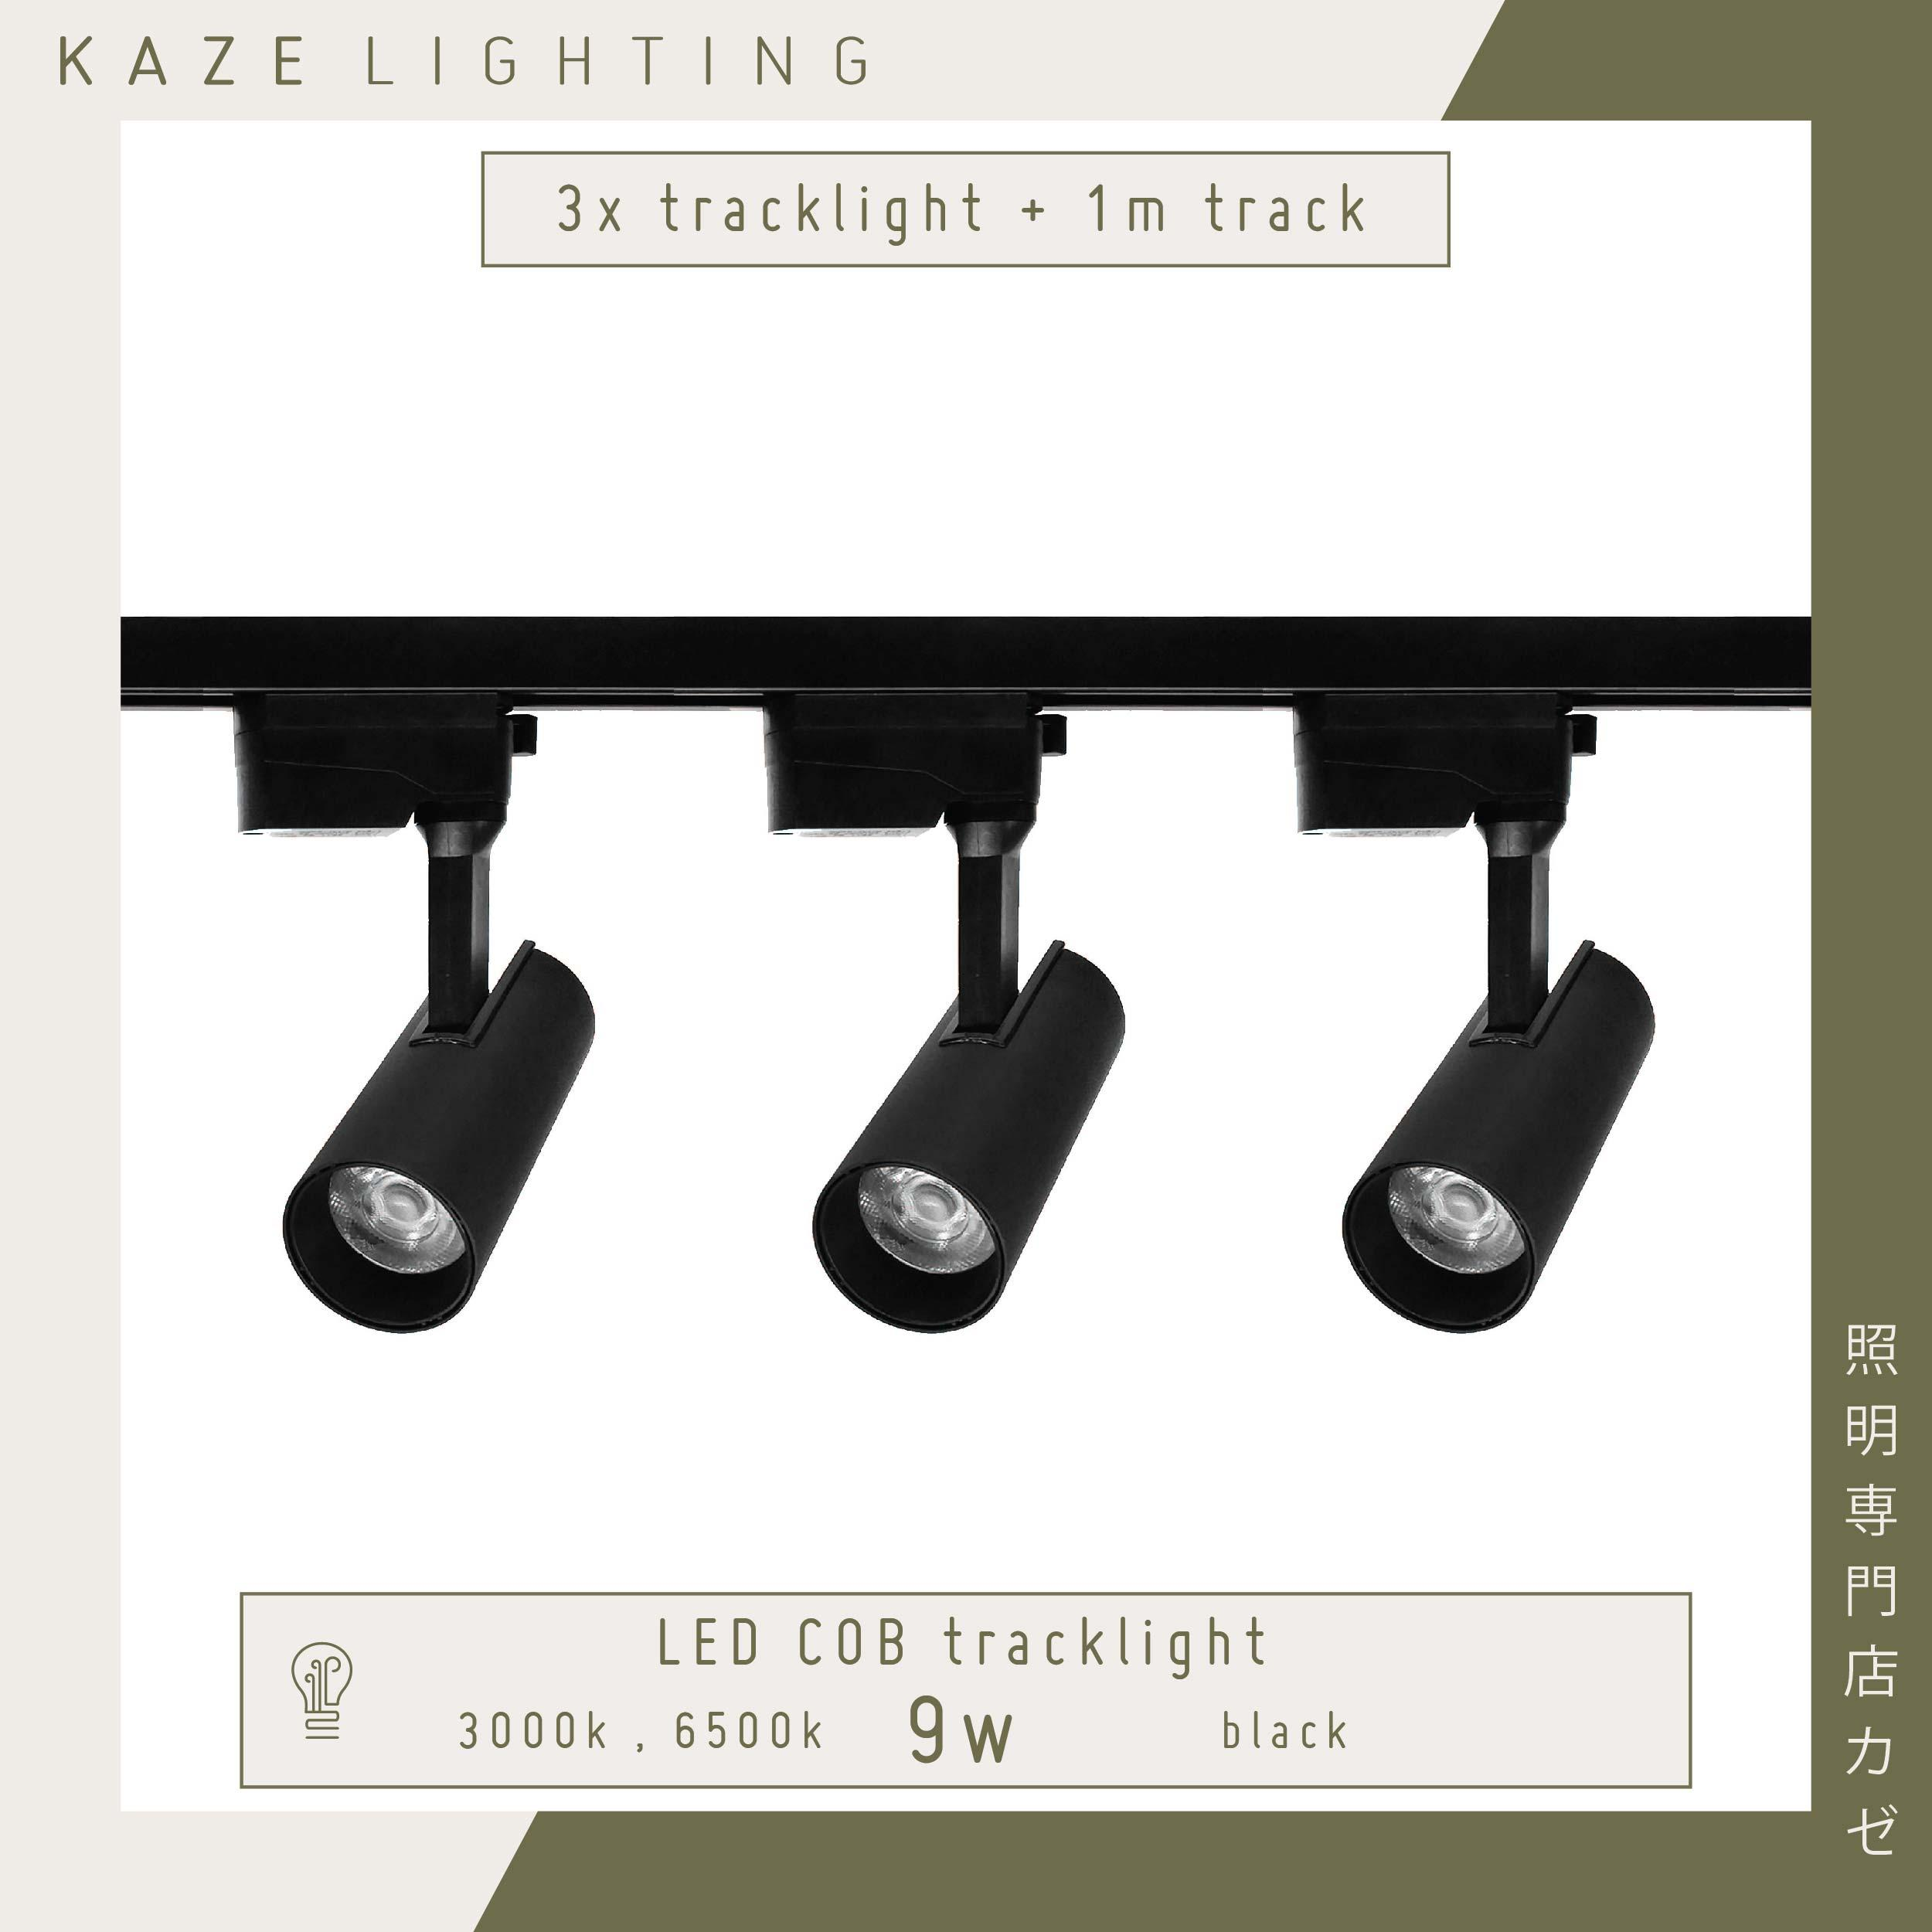 LED COB Track Light 3000K 9w x3 + 1m track